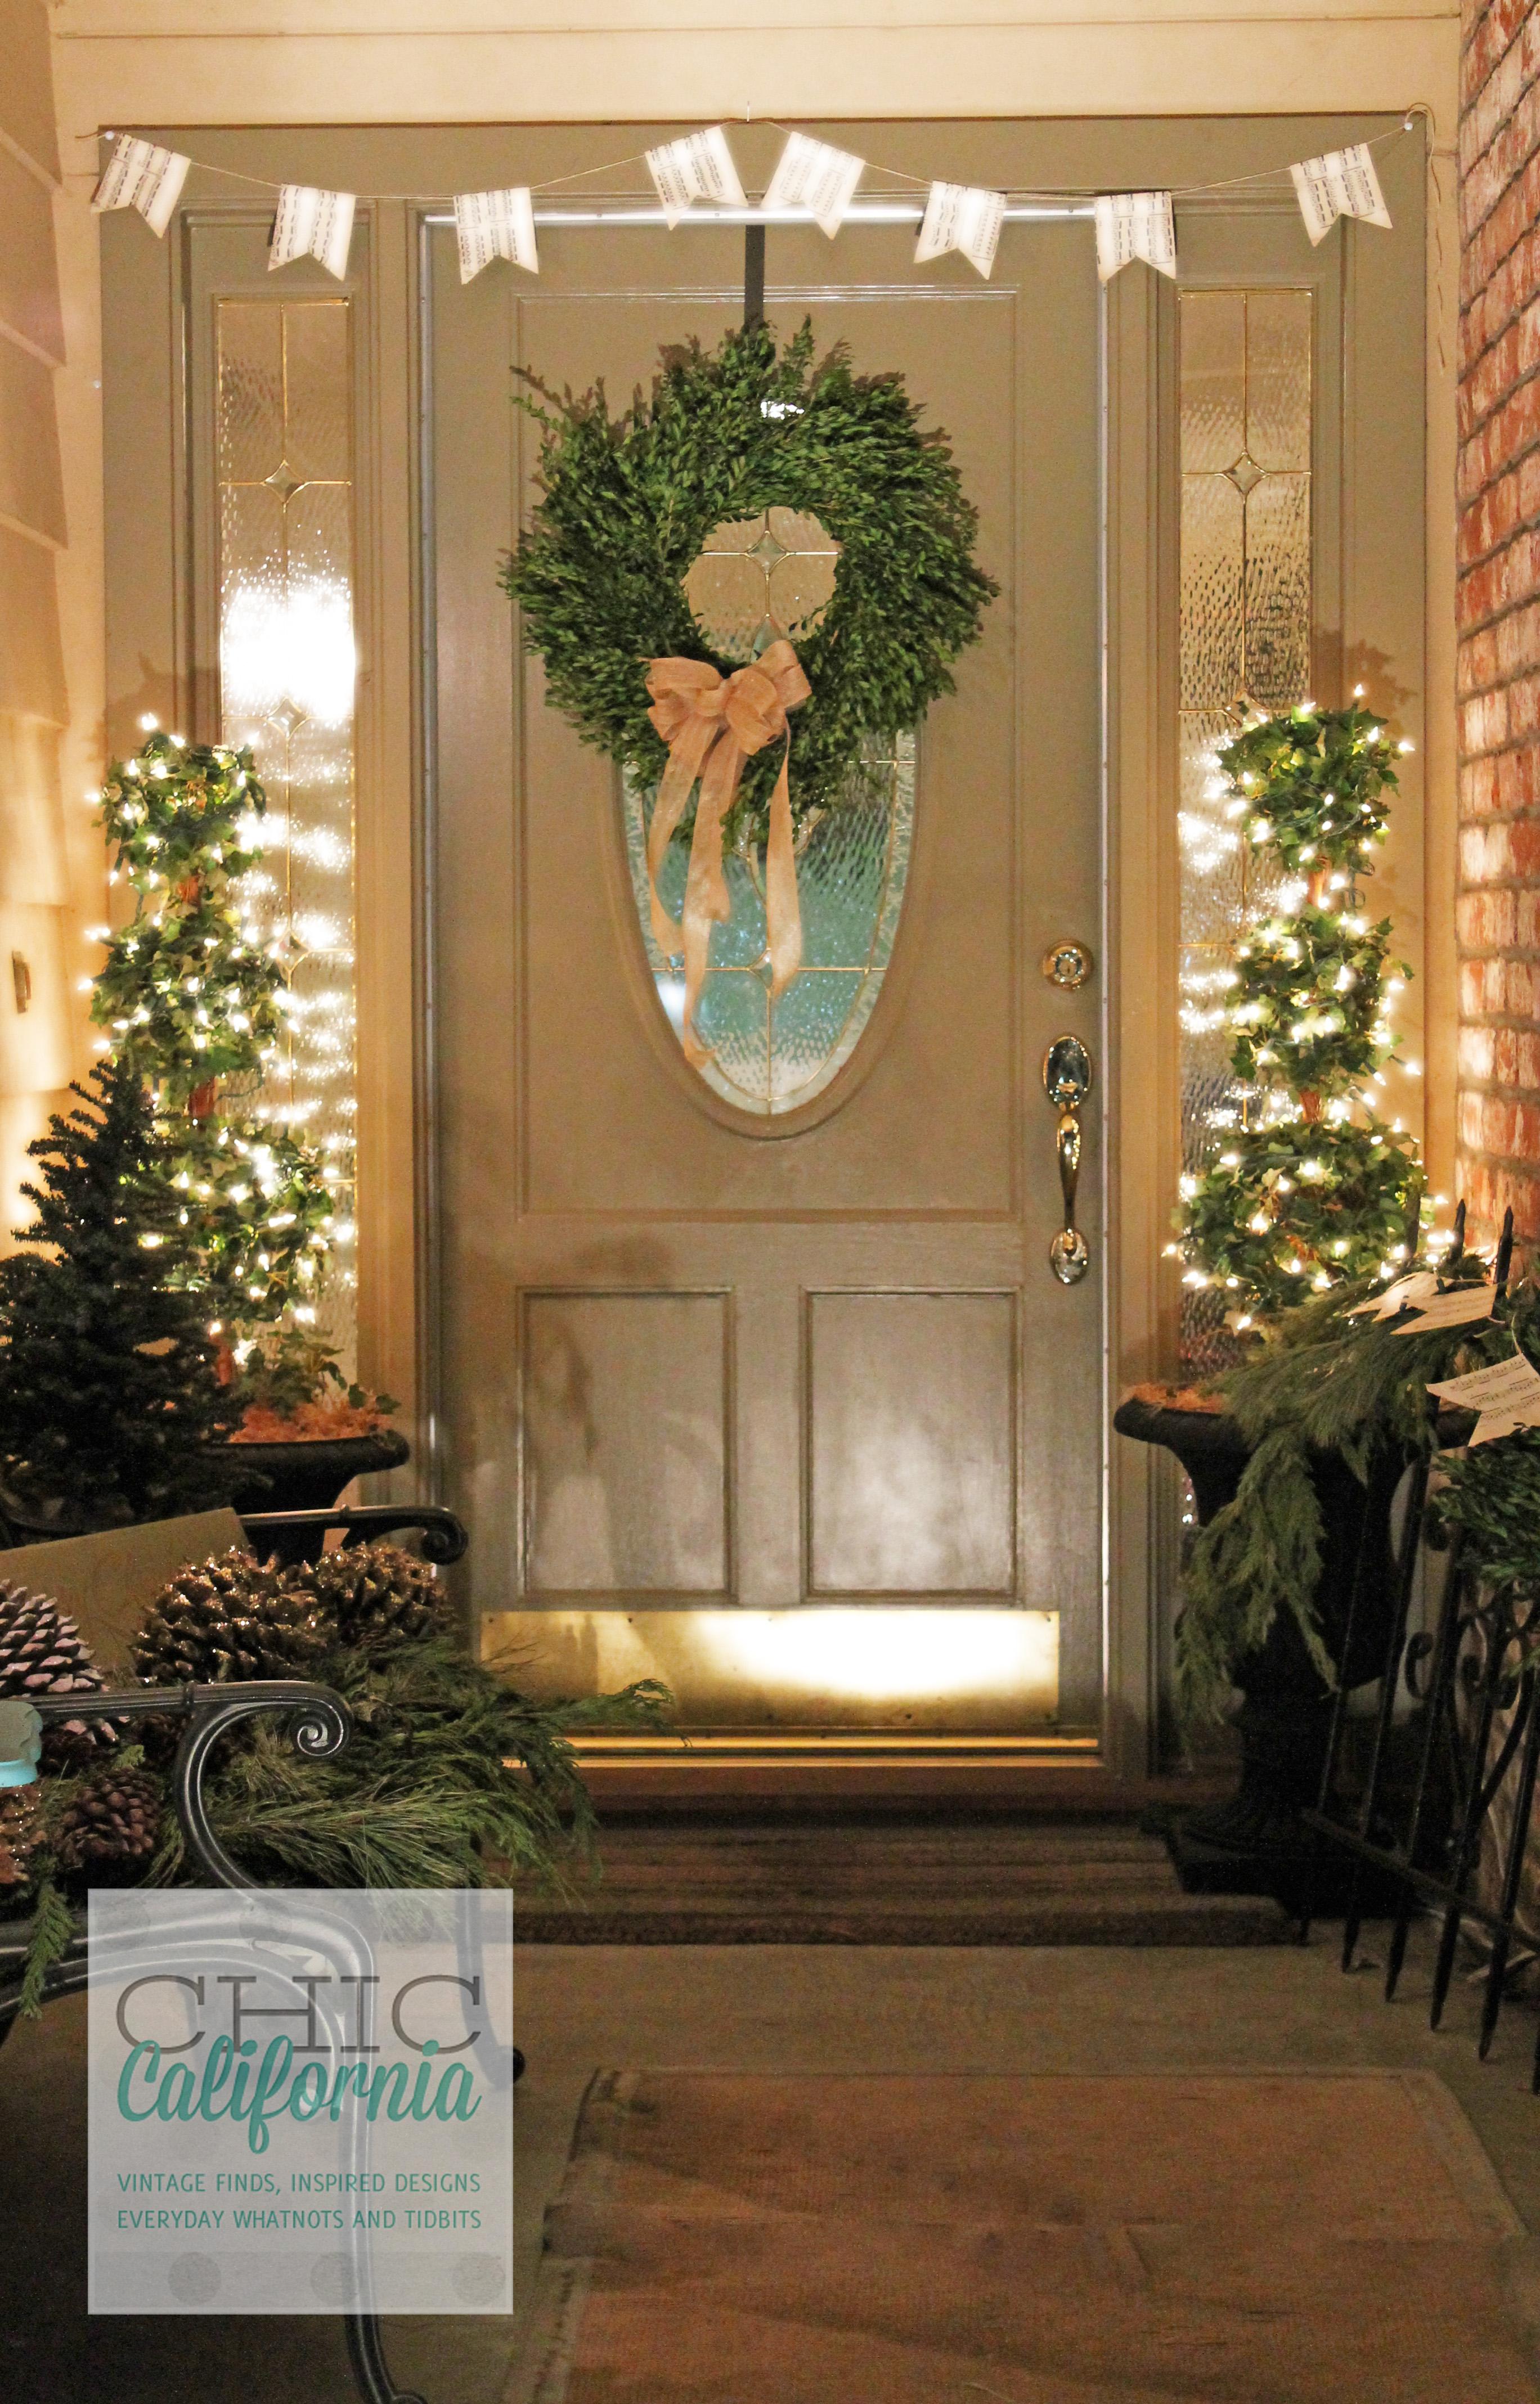 Front door christmas lights - Holiday Decorations Christmas Decorations Boxwood Wreath Front Door Christmas Lights Holiday